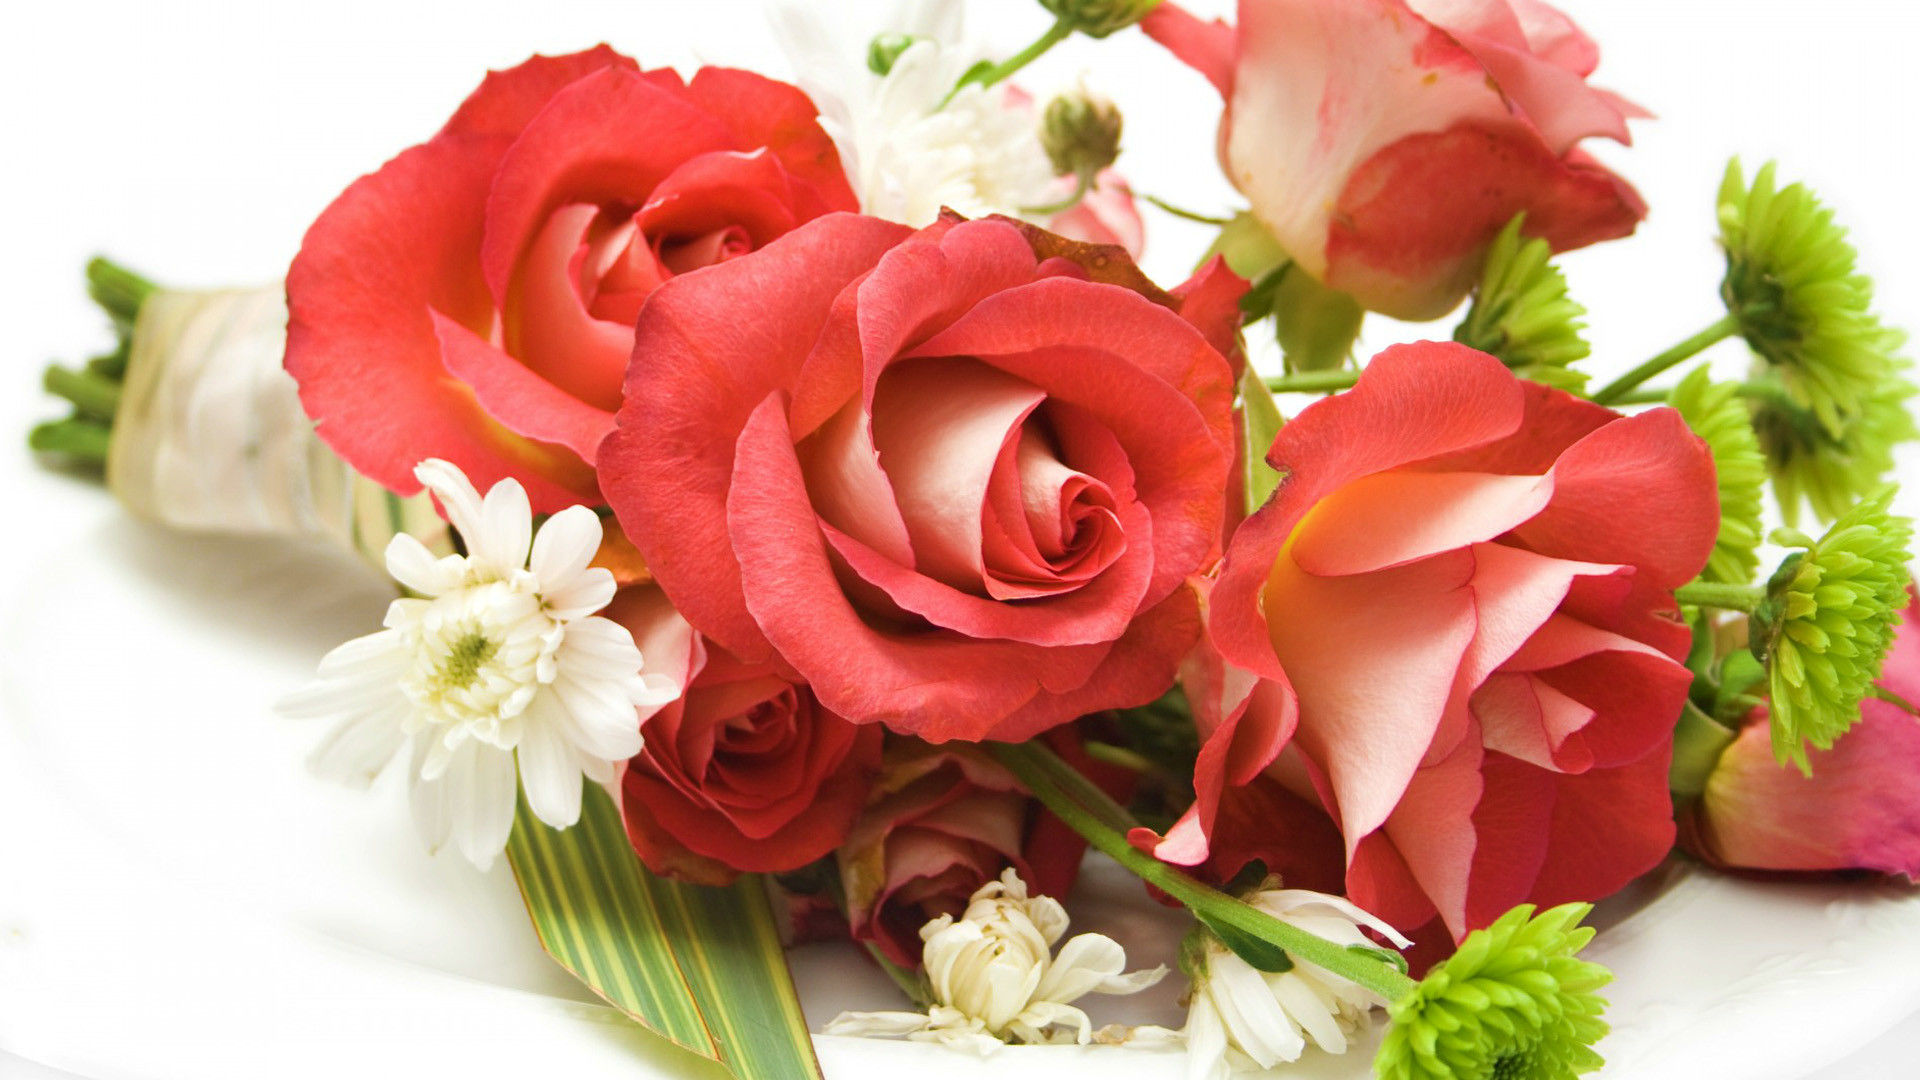 Beautiful Rose Wallpapers Hd 62 Images